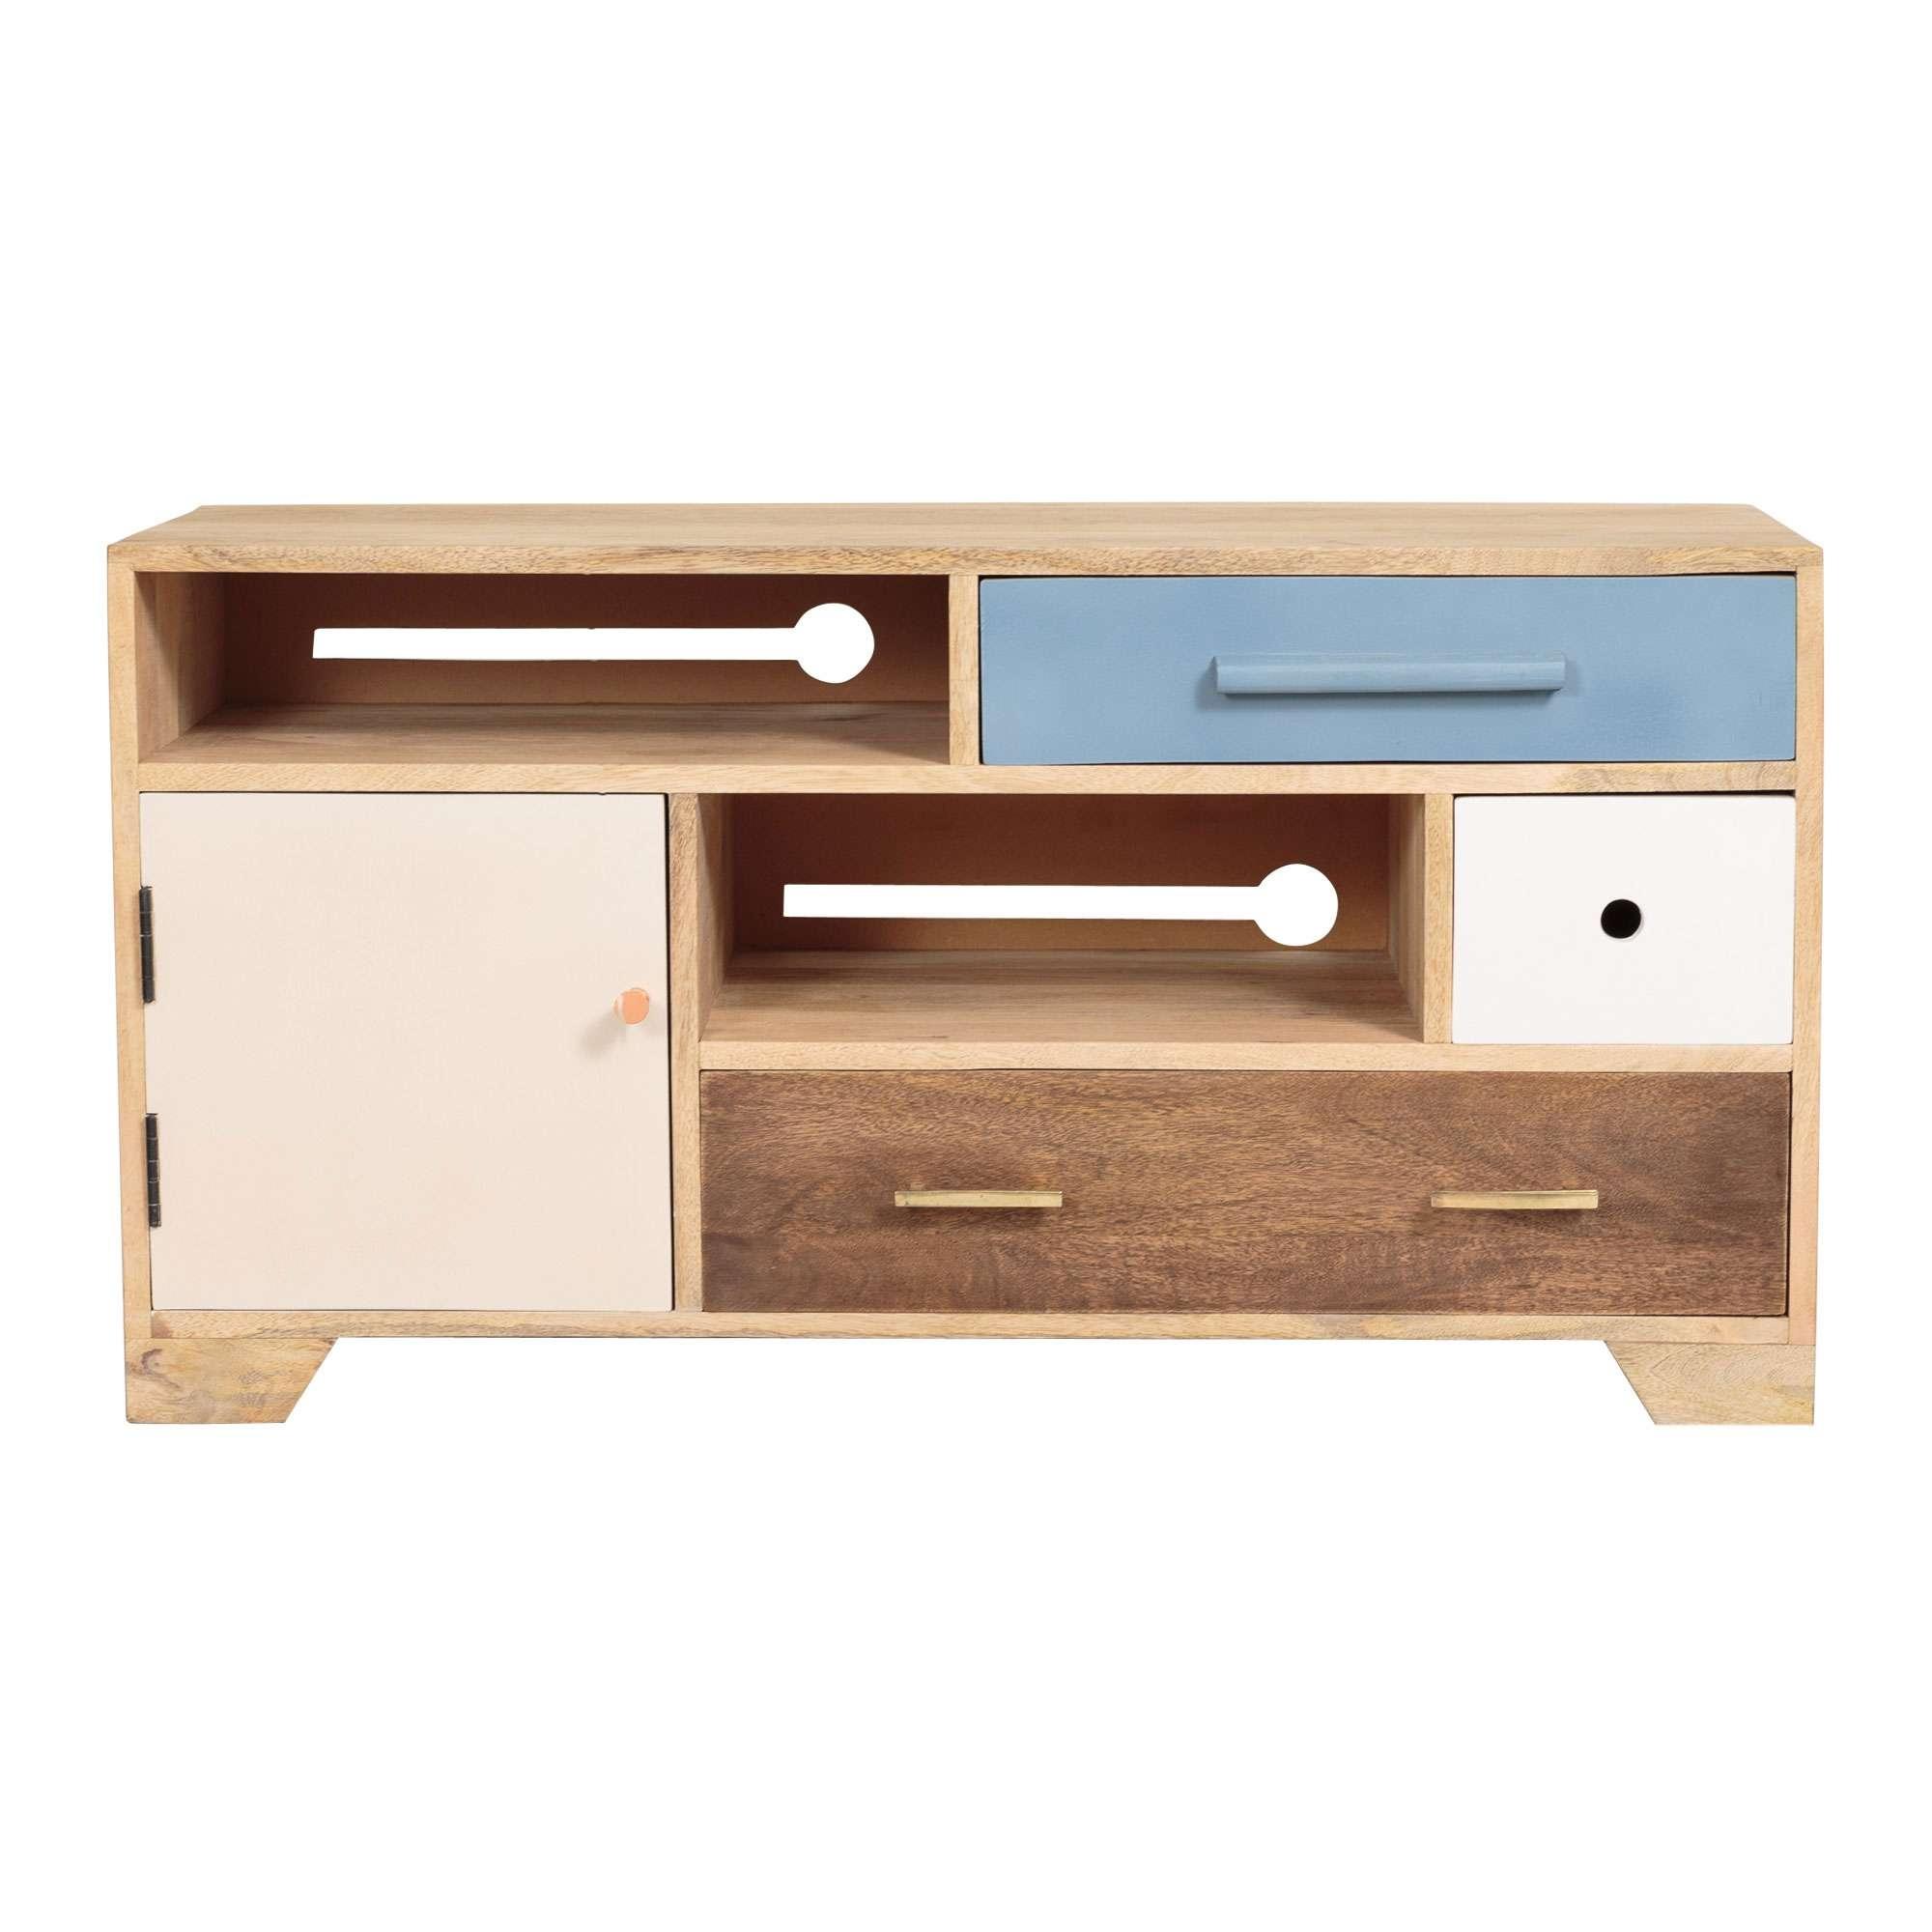 Jennifer Wooden Tv Cabinet | Oliver Bonas Regarding Mango Wood Tv Cabinets (View 17 of 20)